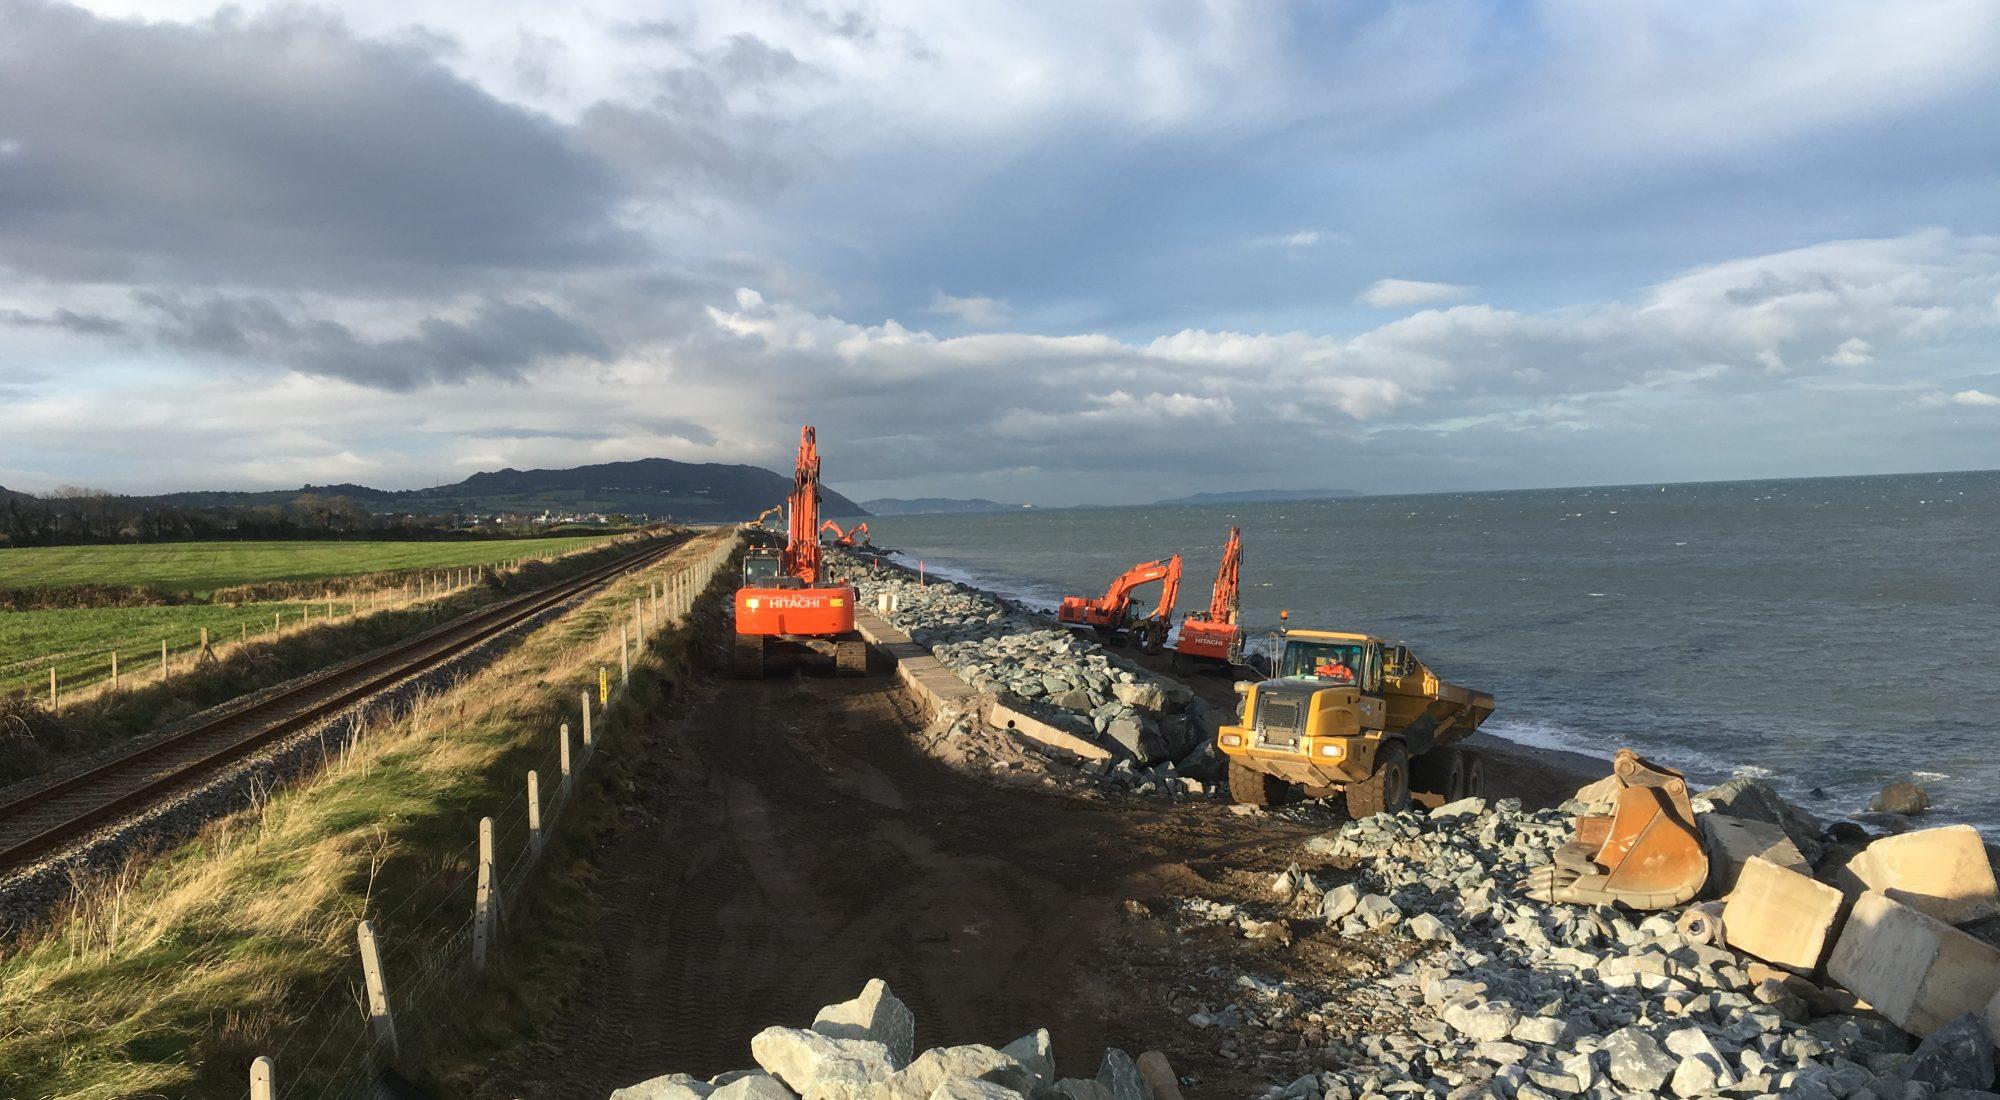 Repairing Coastal Defences between Dublin and Rosslare